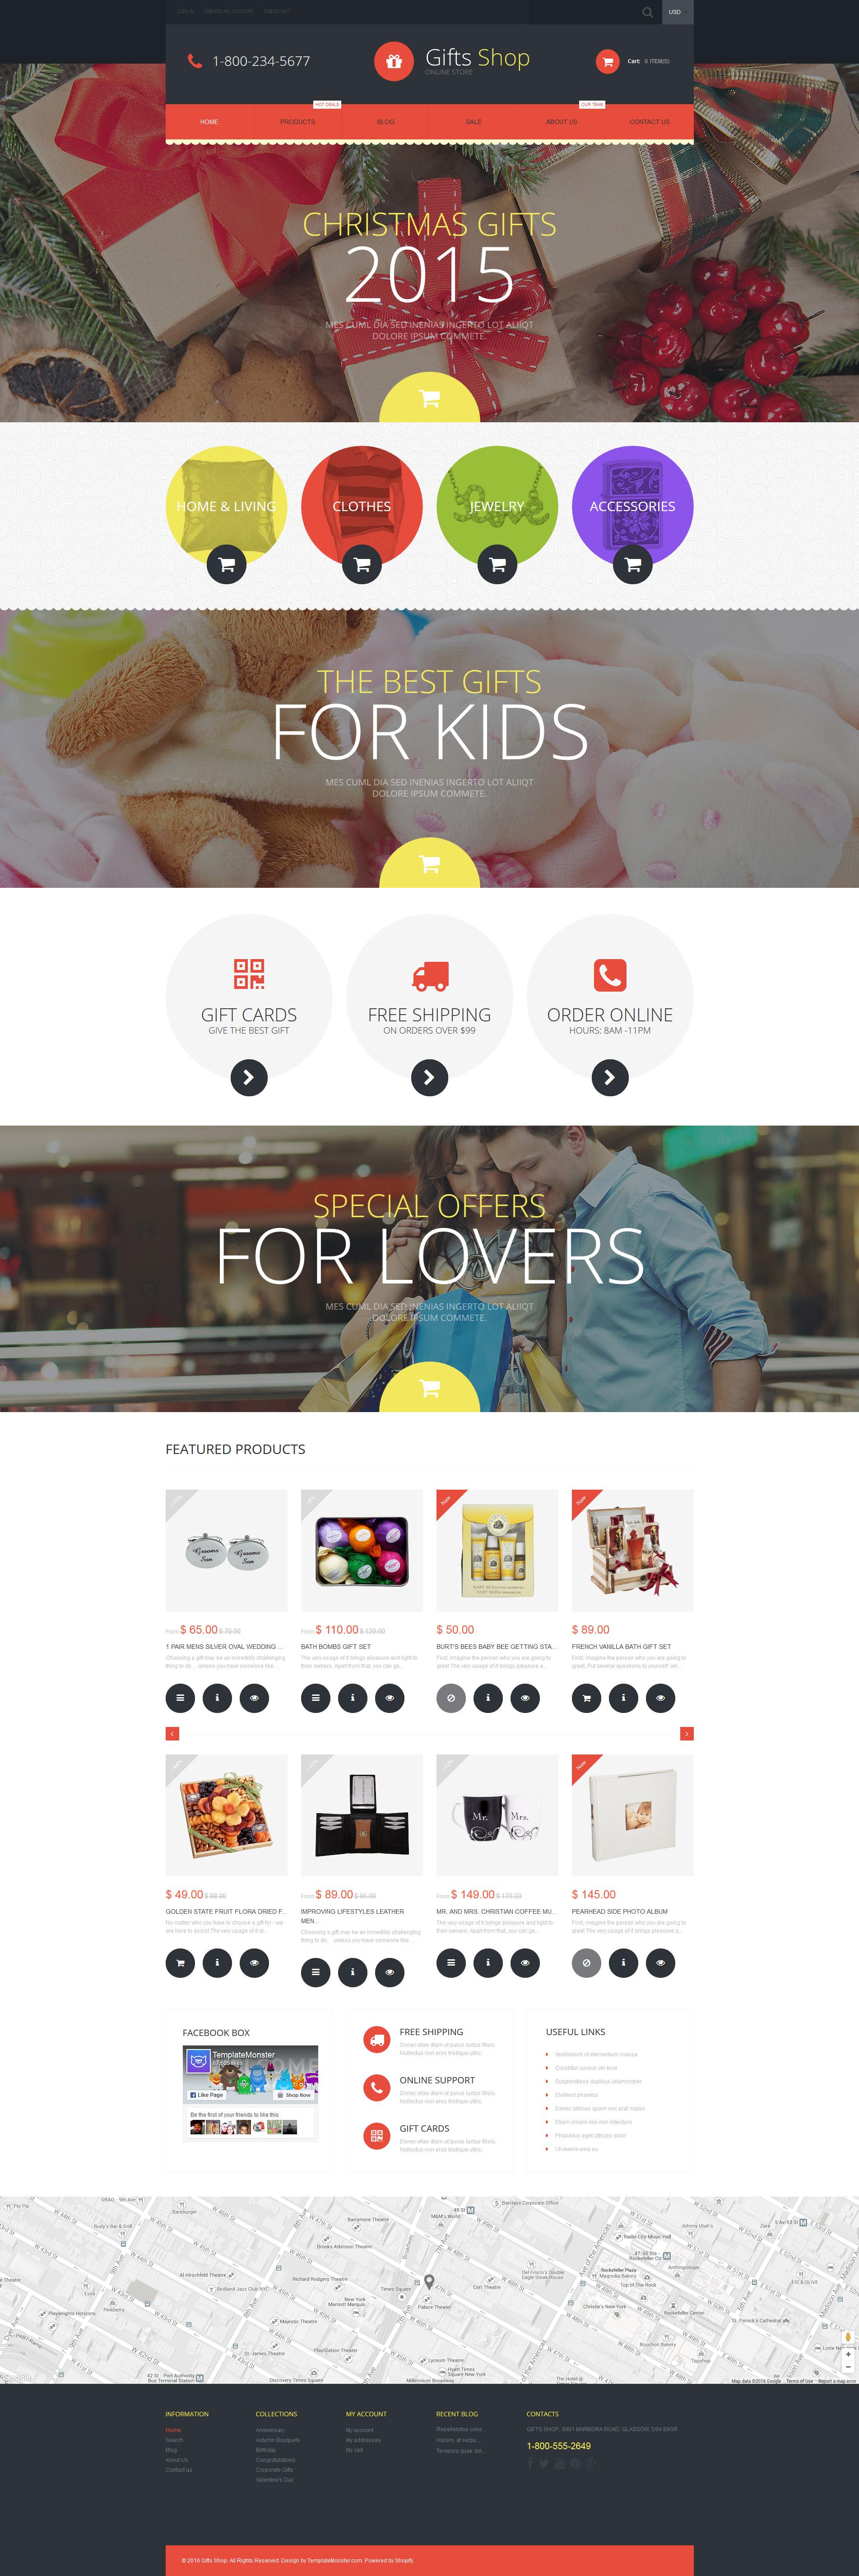 Responsywny szablon Shopify Sklep z prezentami #55607